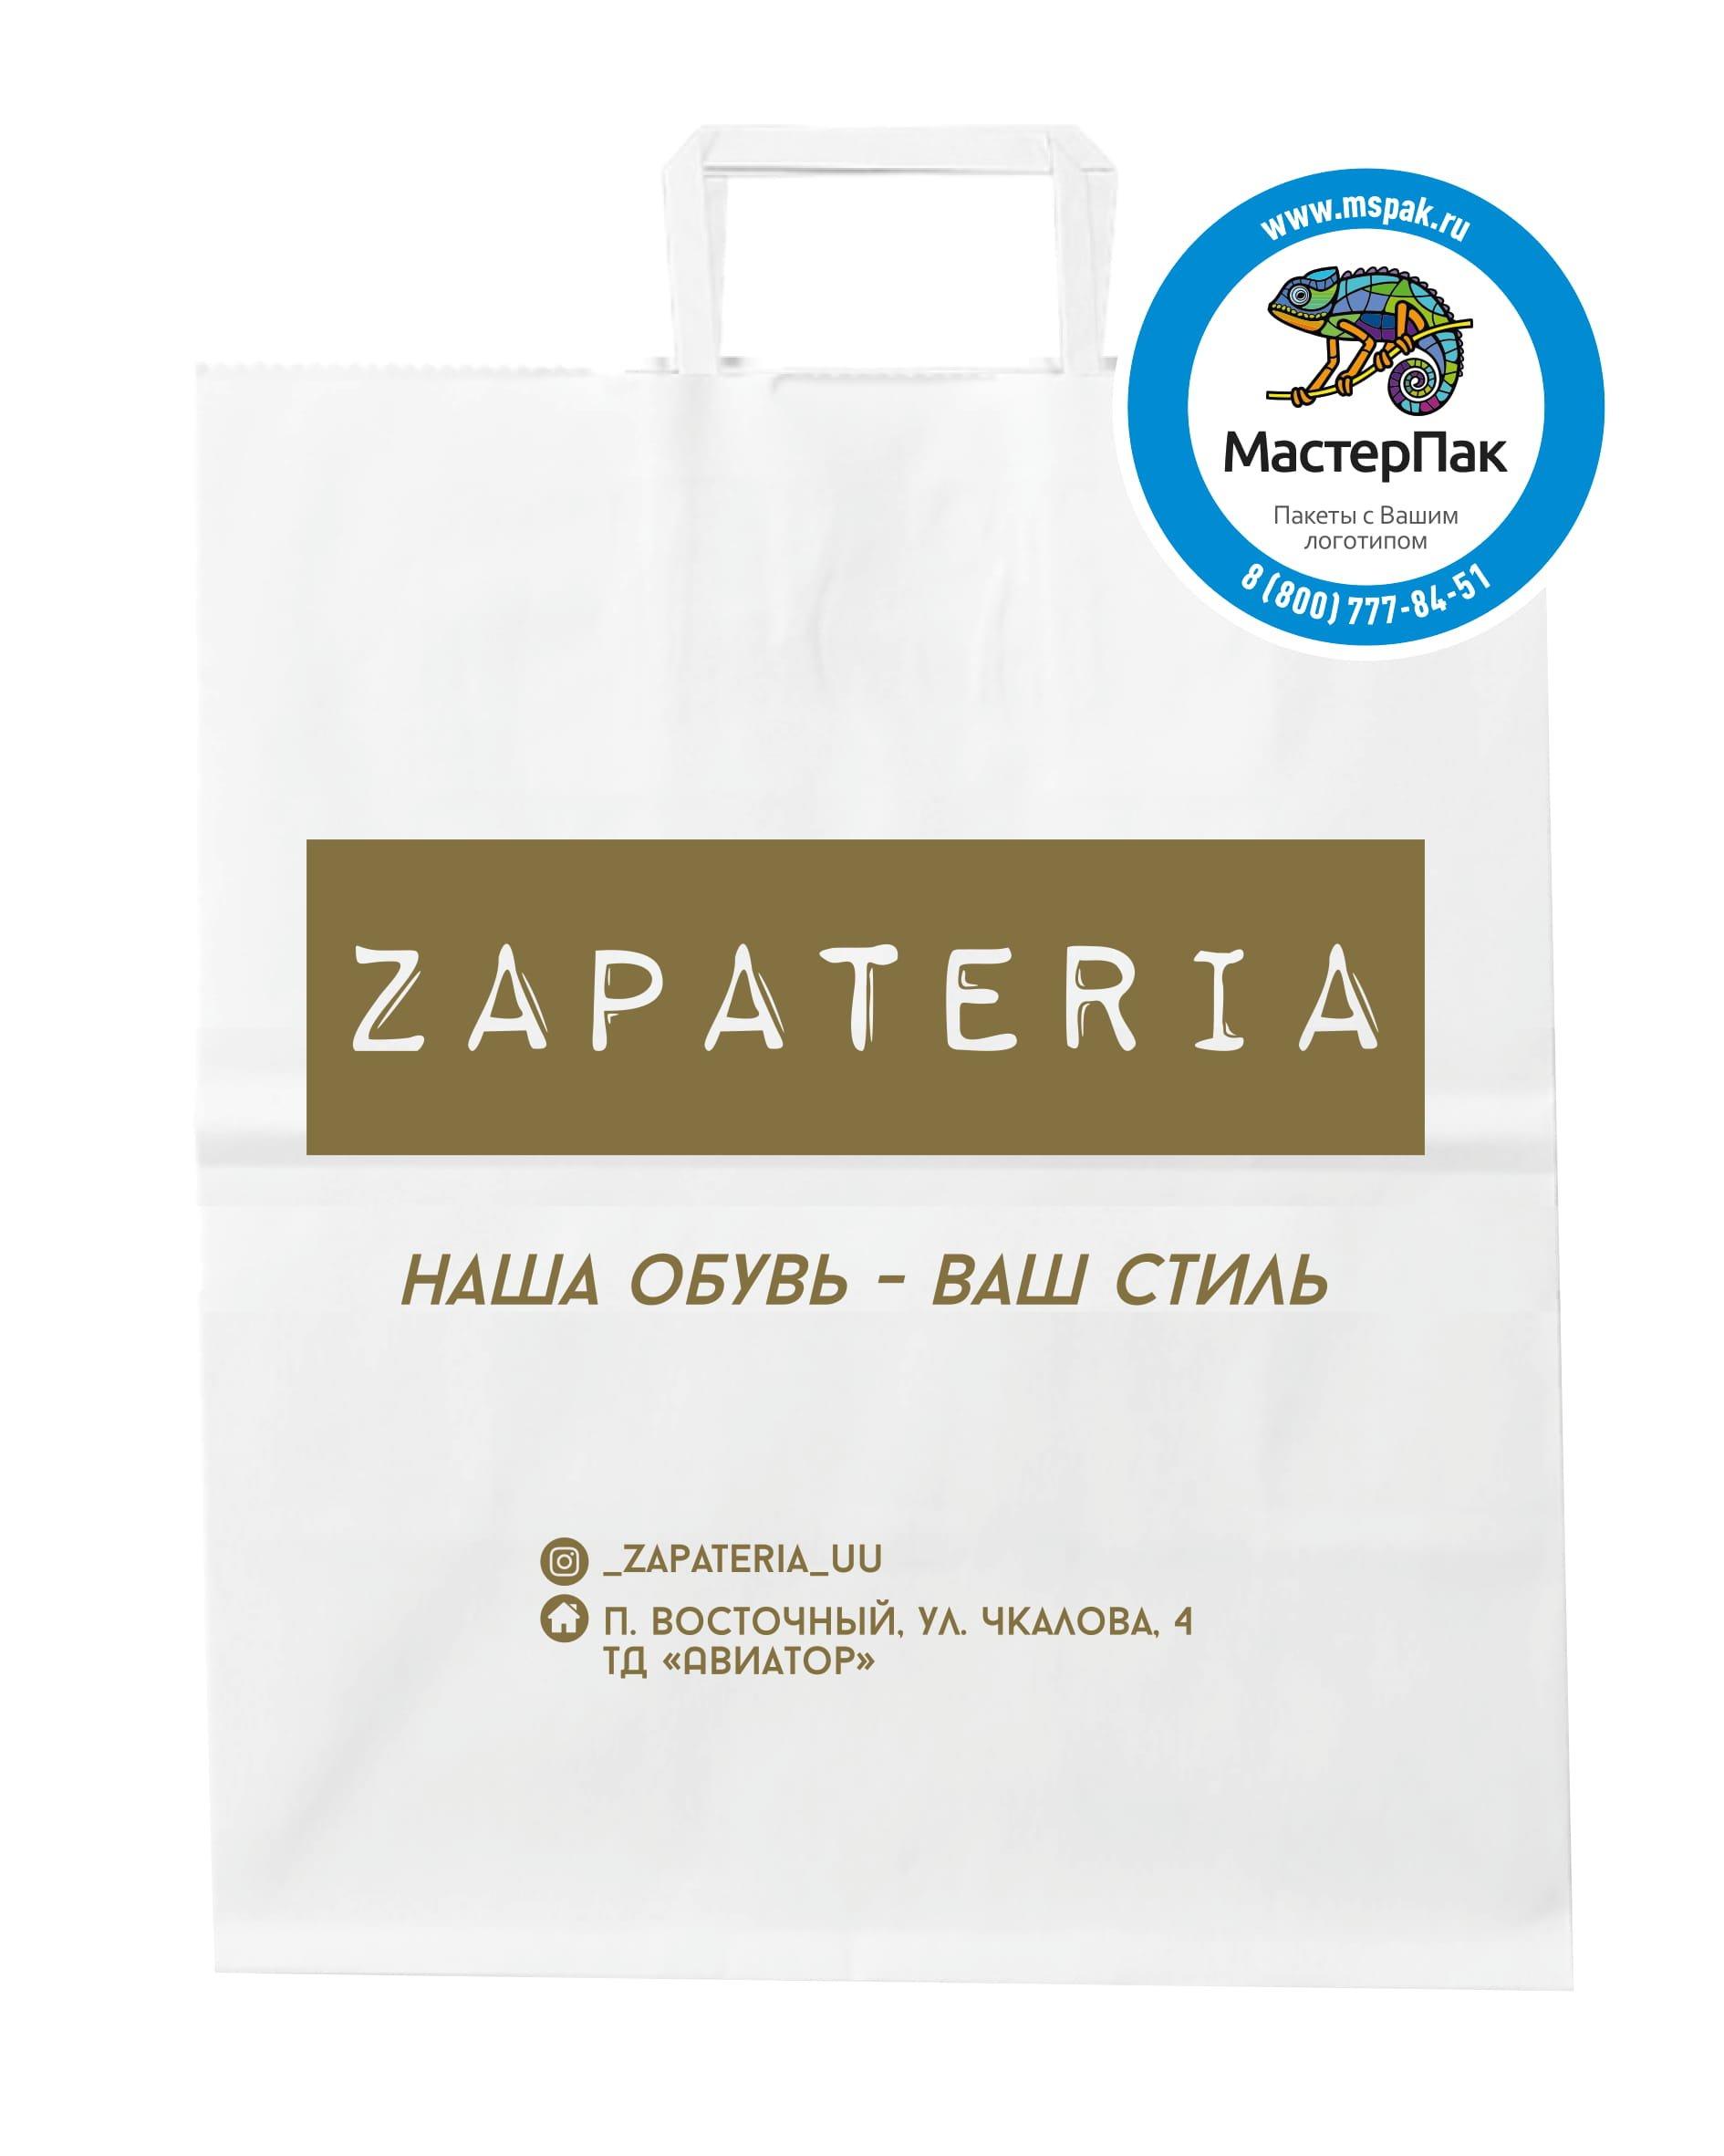 Пакет крафт, бумажный с логотипом Zapateria, Республика Саха (Якутия), 32*60 см